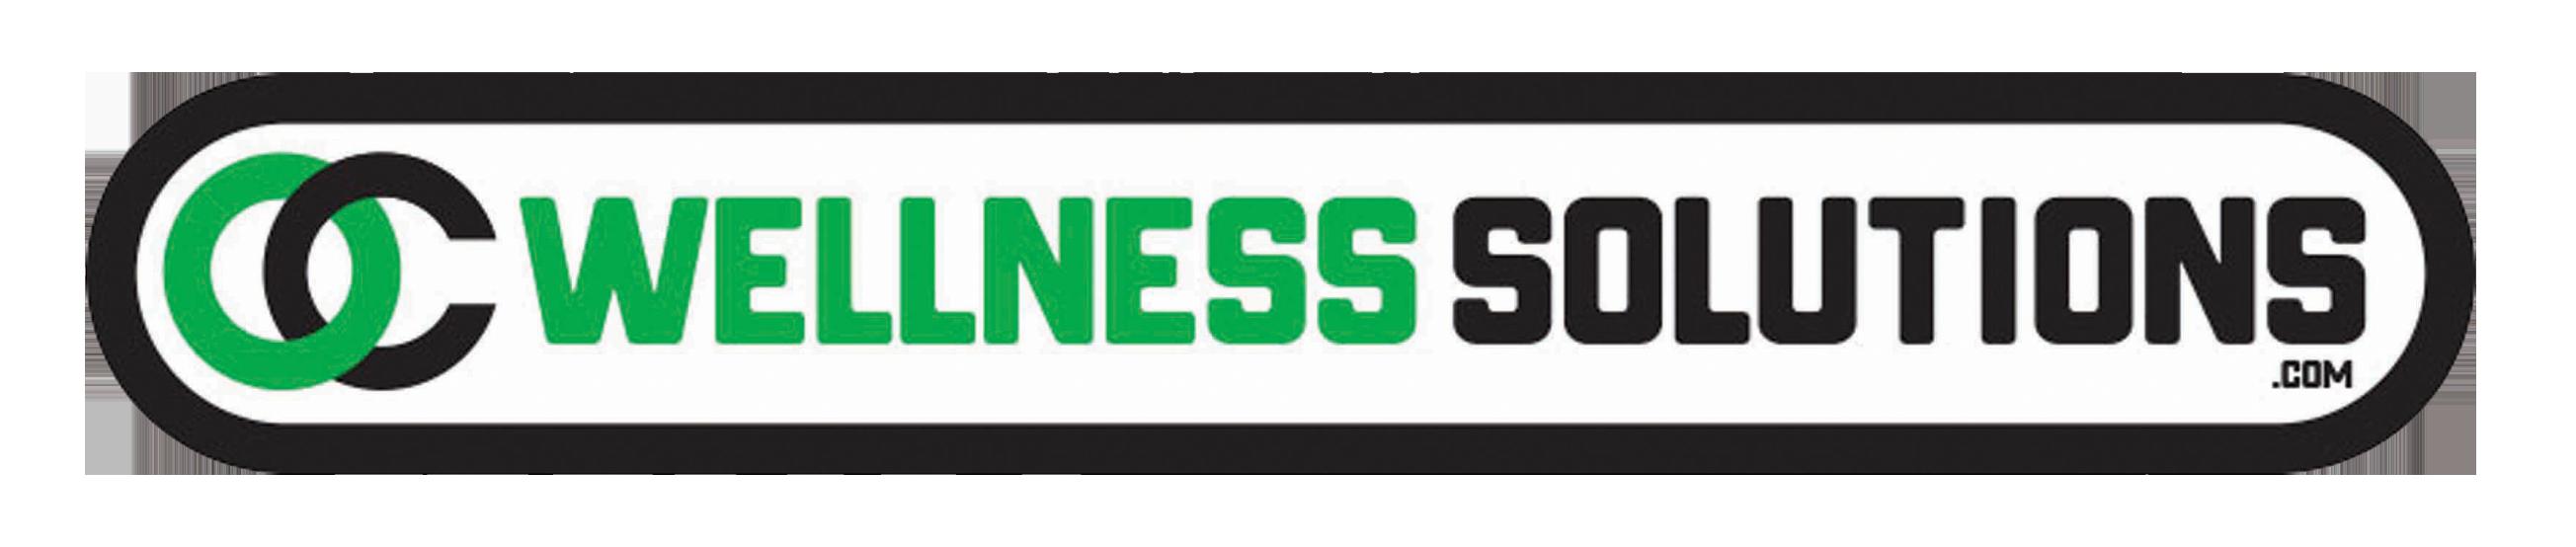 OC Wellness Solutions releases 4th of July 'HAPPY PET' CBD Bundle